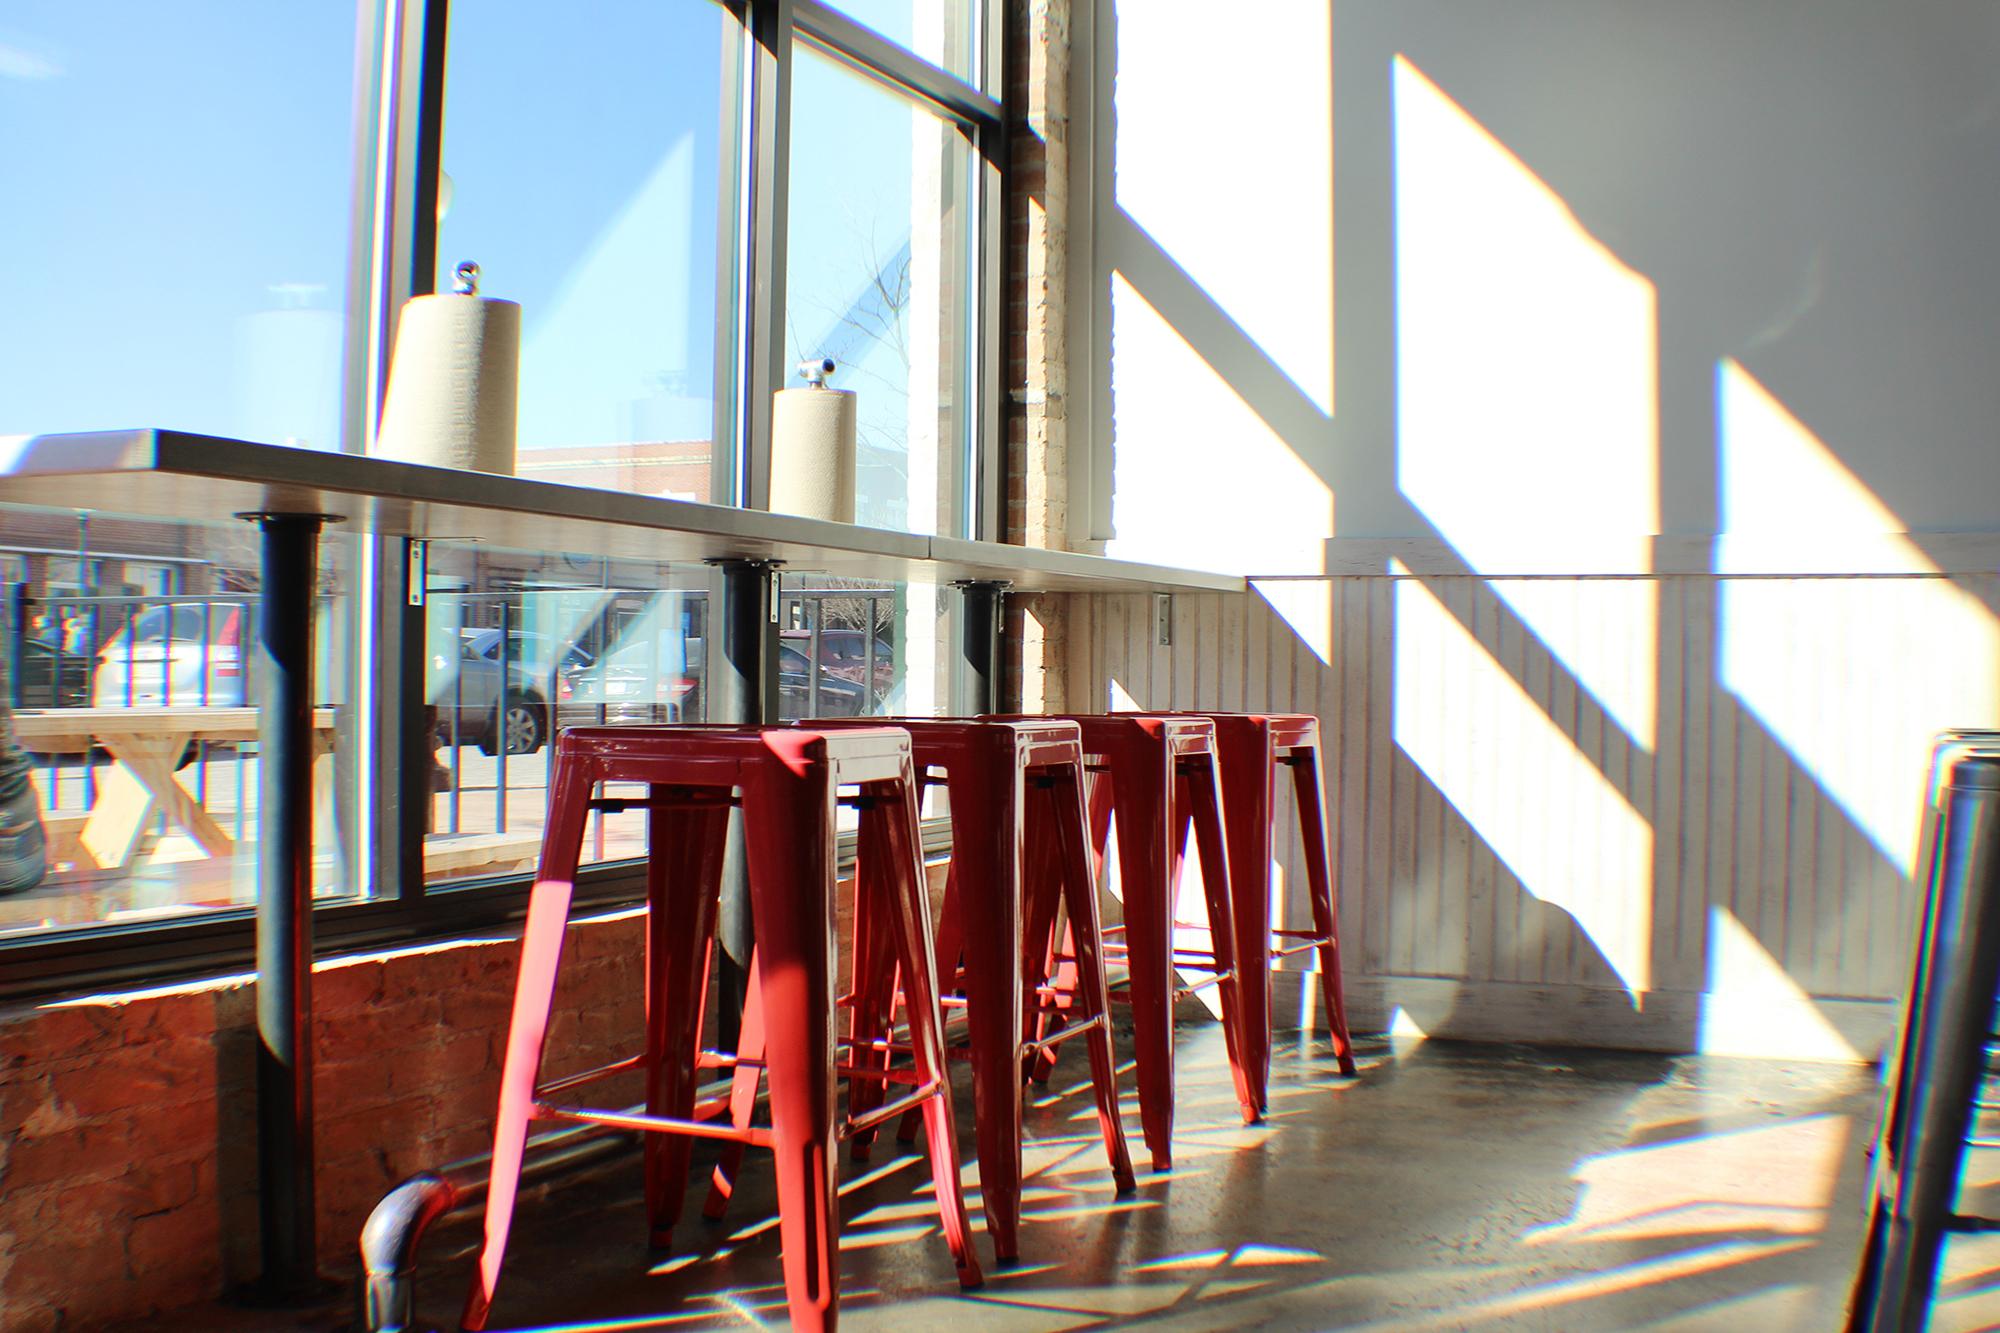 Sunshine and ceviche await at C'Viche.